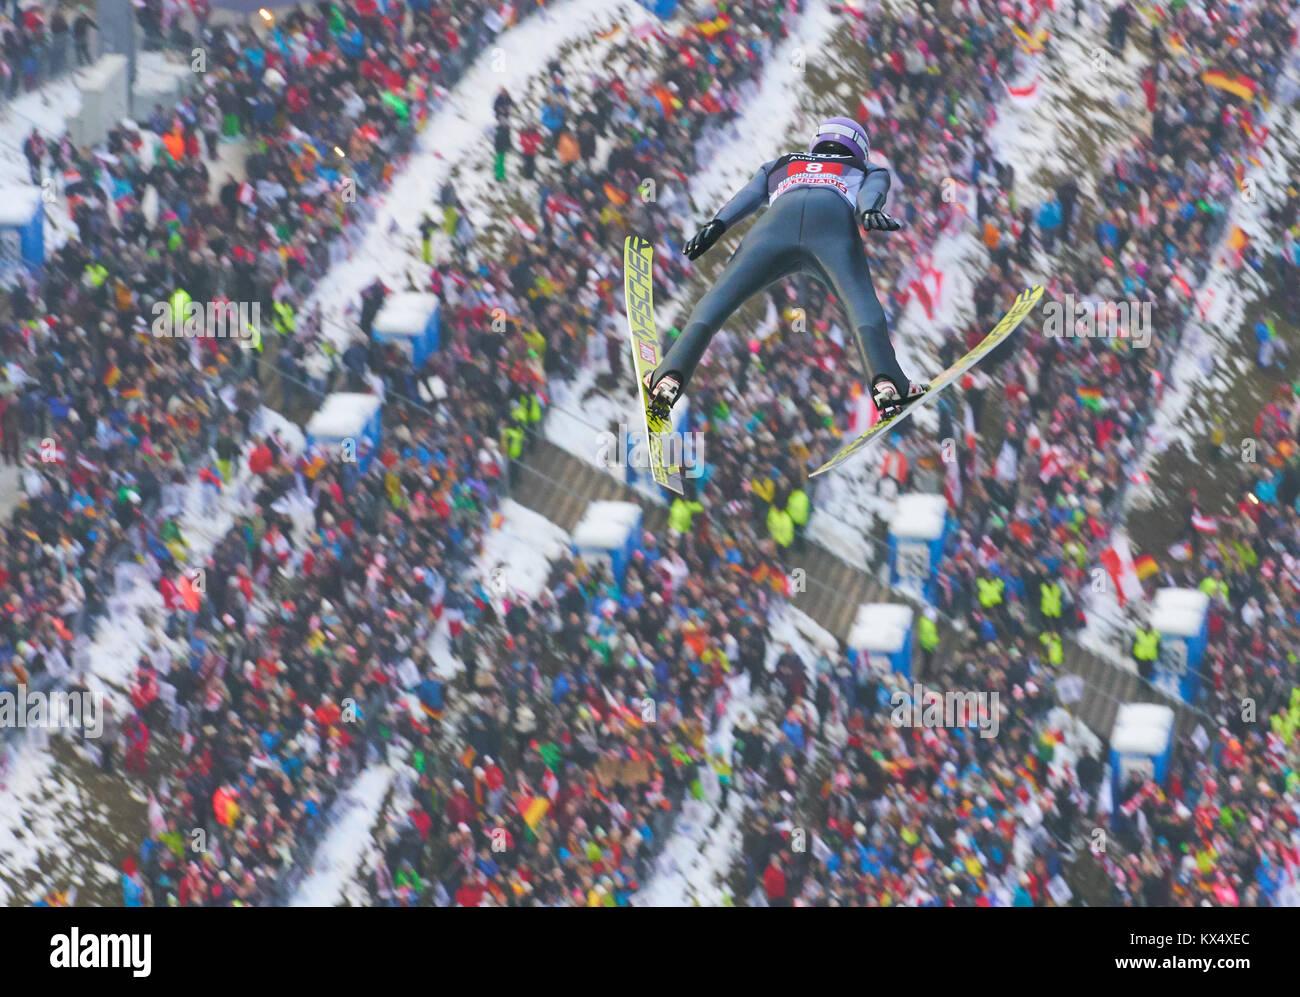 skispringen in bischofshofen